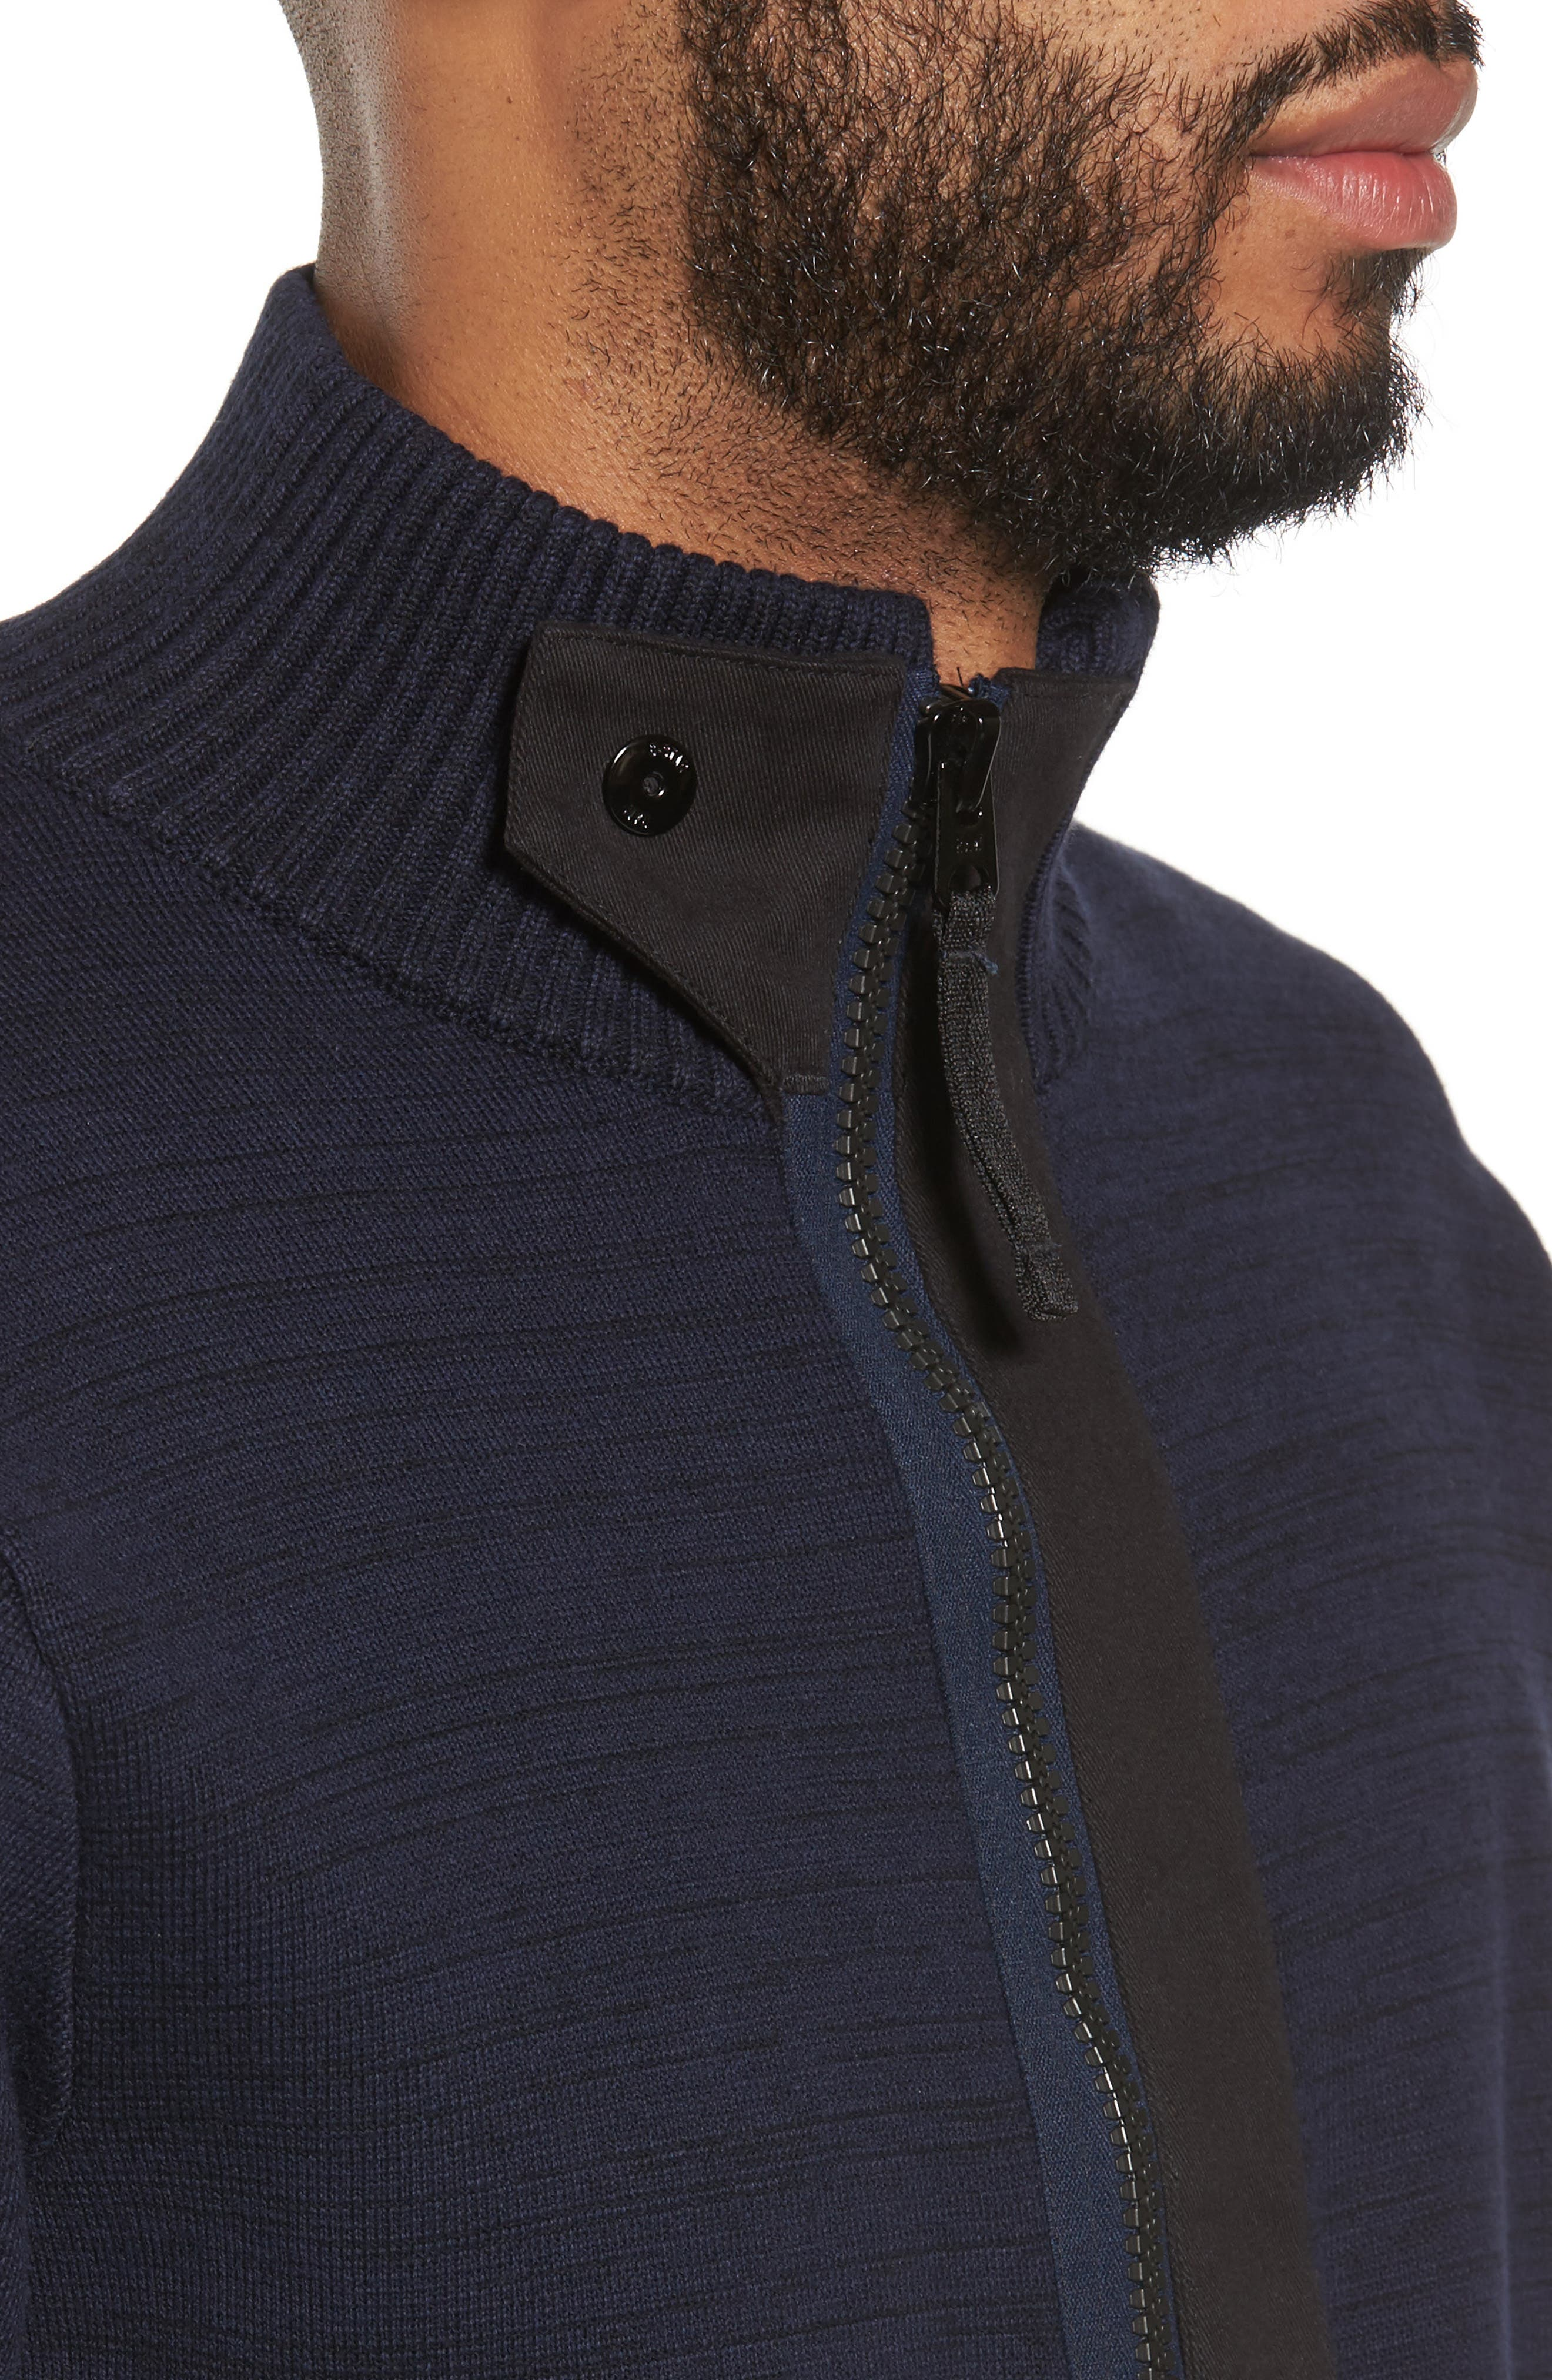 Empral Half-Zip Sweater,                             Alternate thumbnail 4, color,                             Blue/ Dark Black